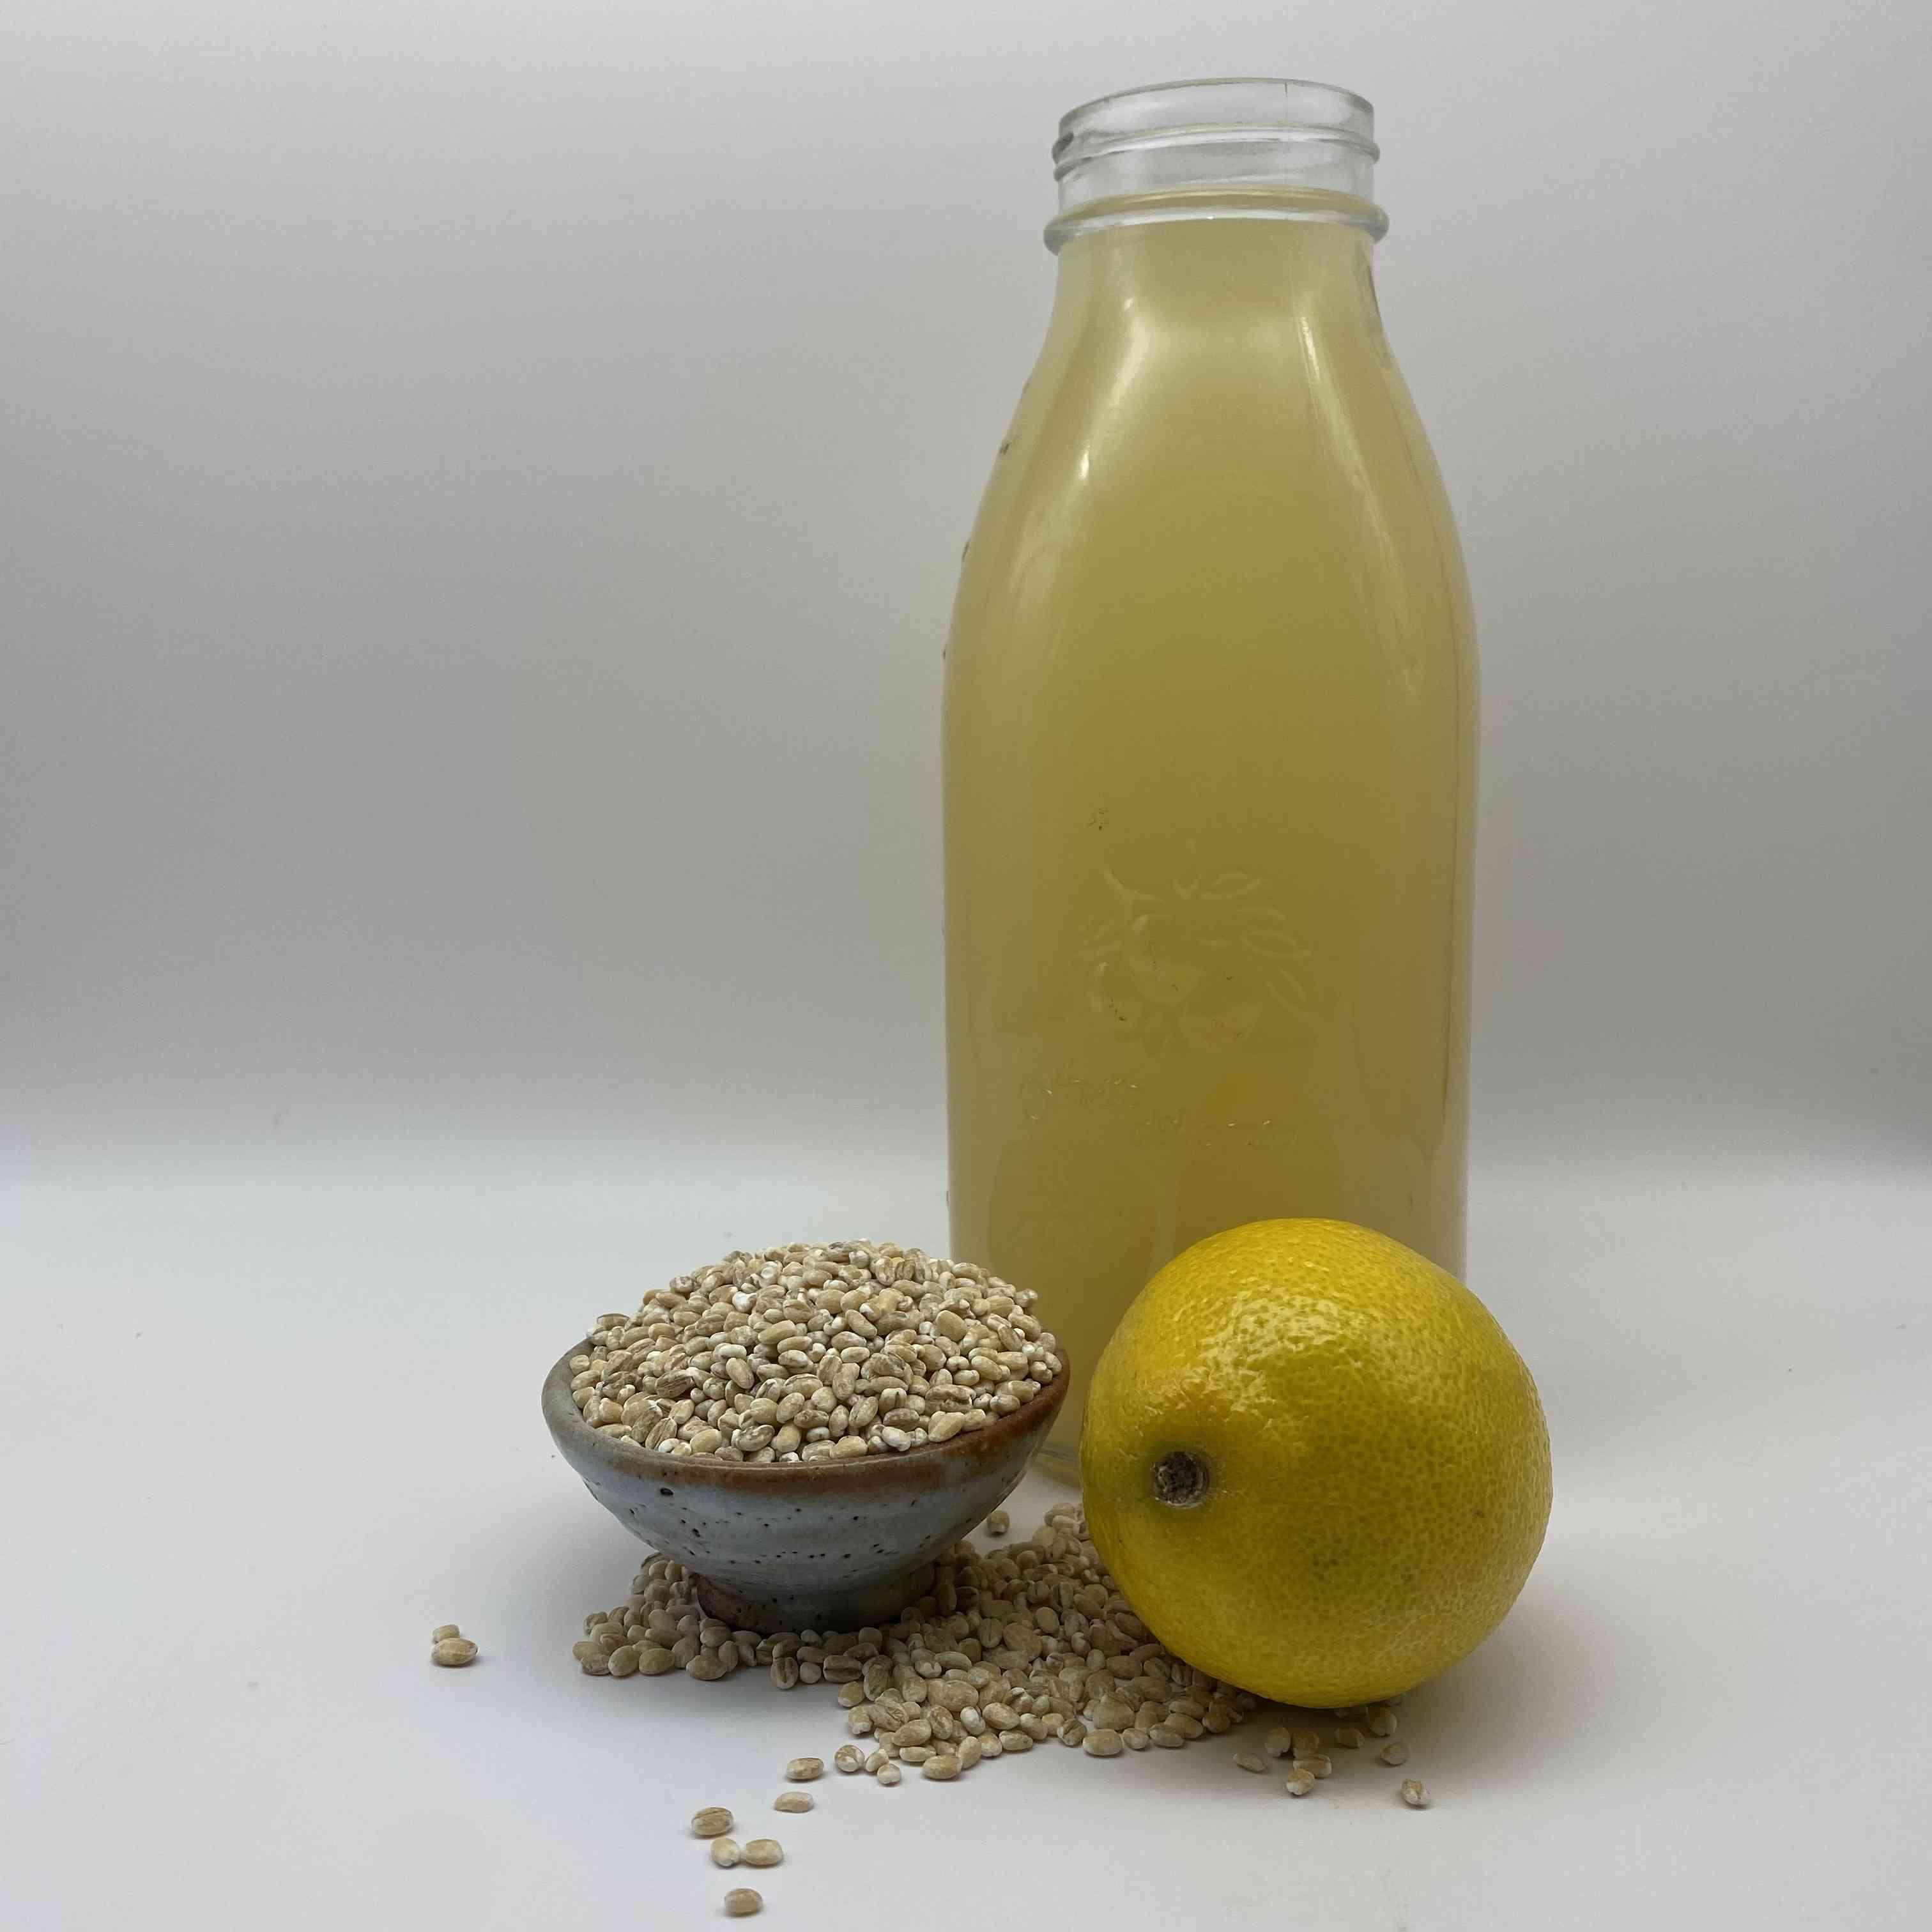 Lemon Barley Water Tester Image